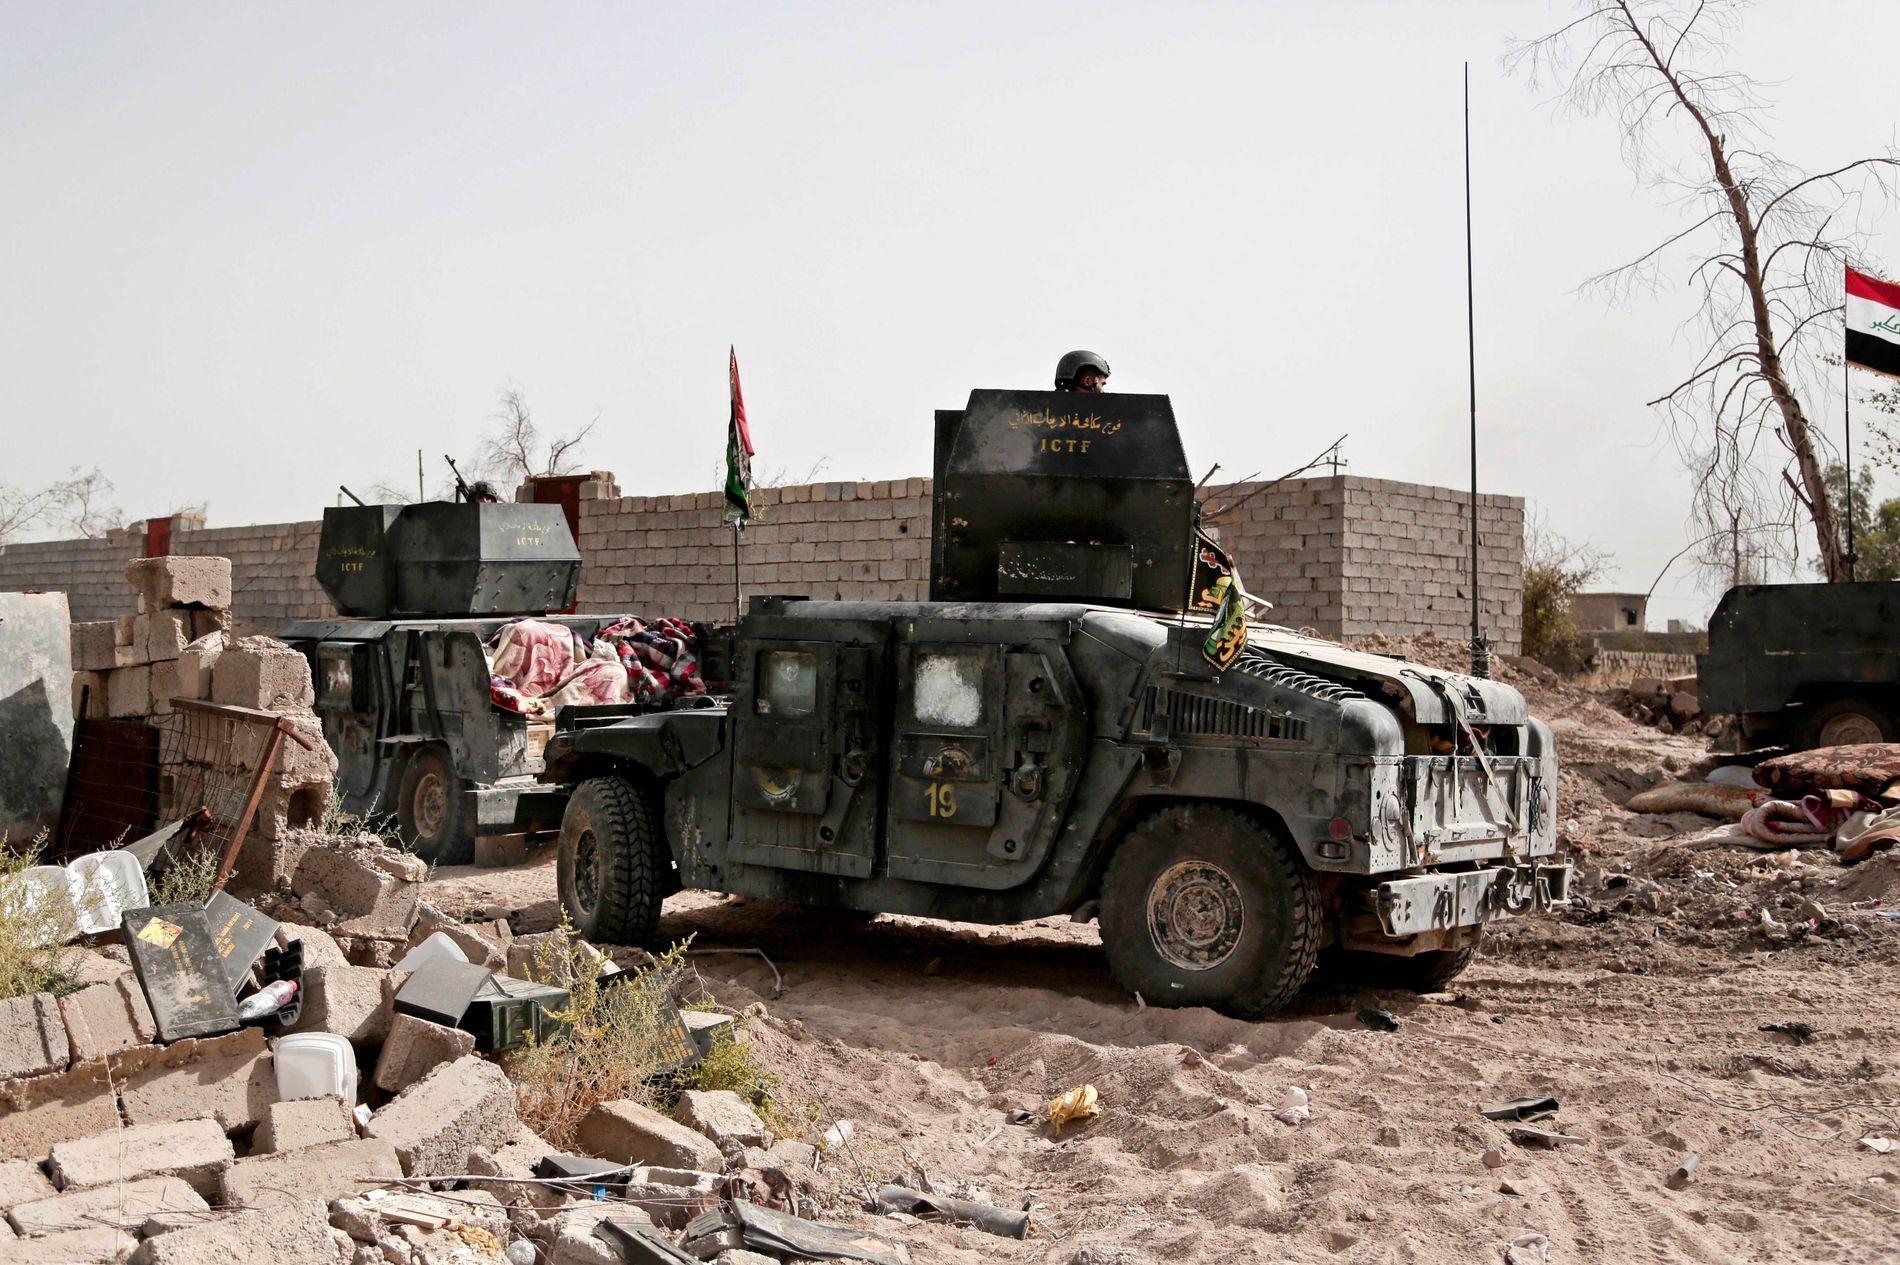 MILEPÆL: Humvee-biler fra irakiske regjeringsstyrker rullet inn i Shuhada-nabolaget i IS-kontrollerte Fallujah i Irak i går.